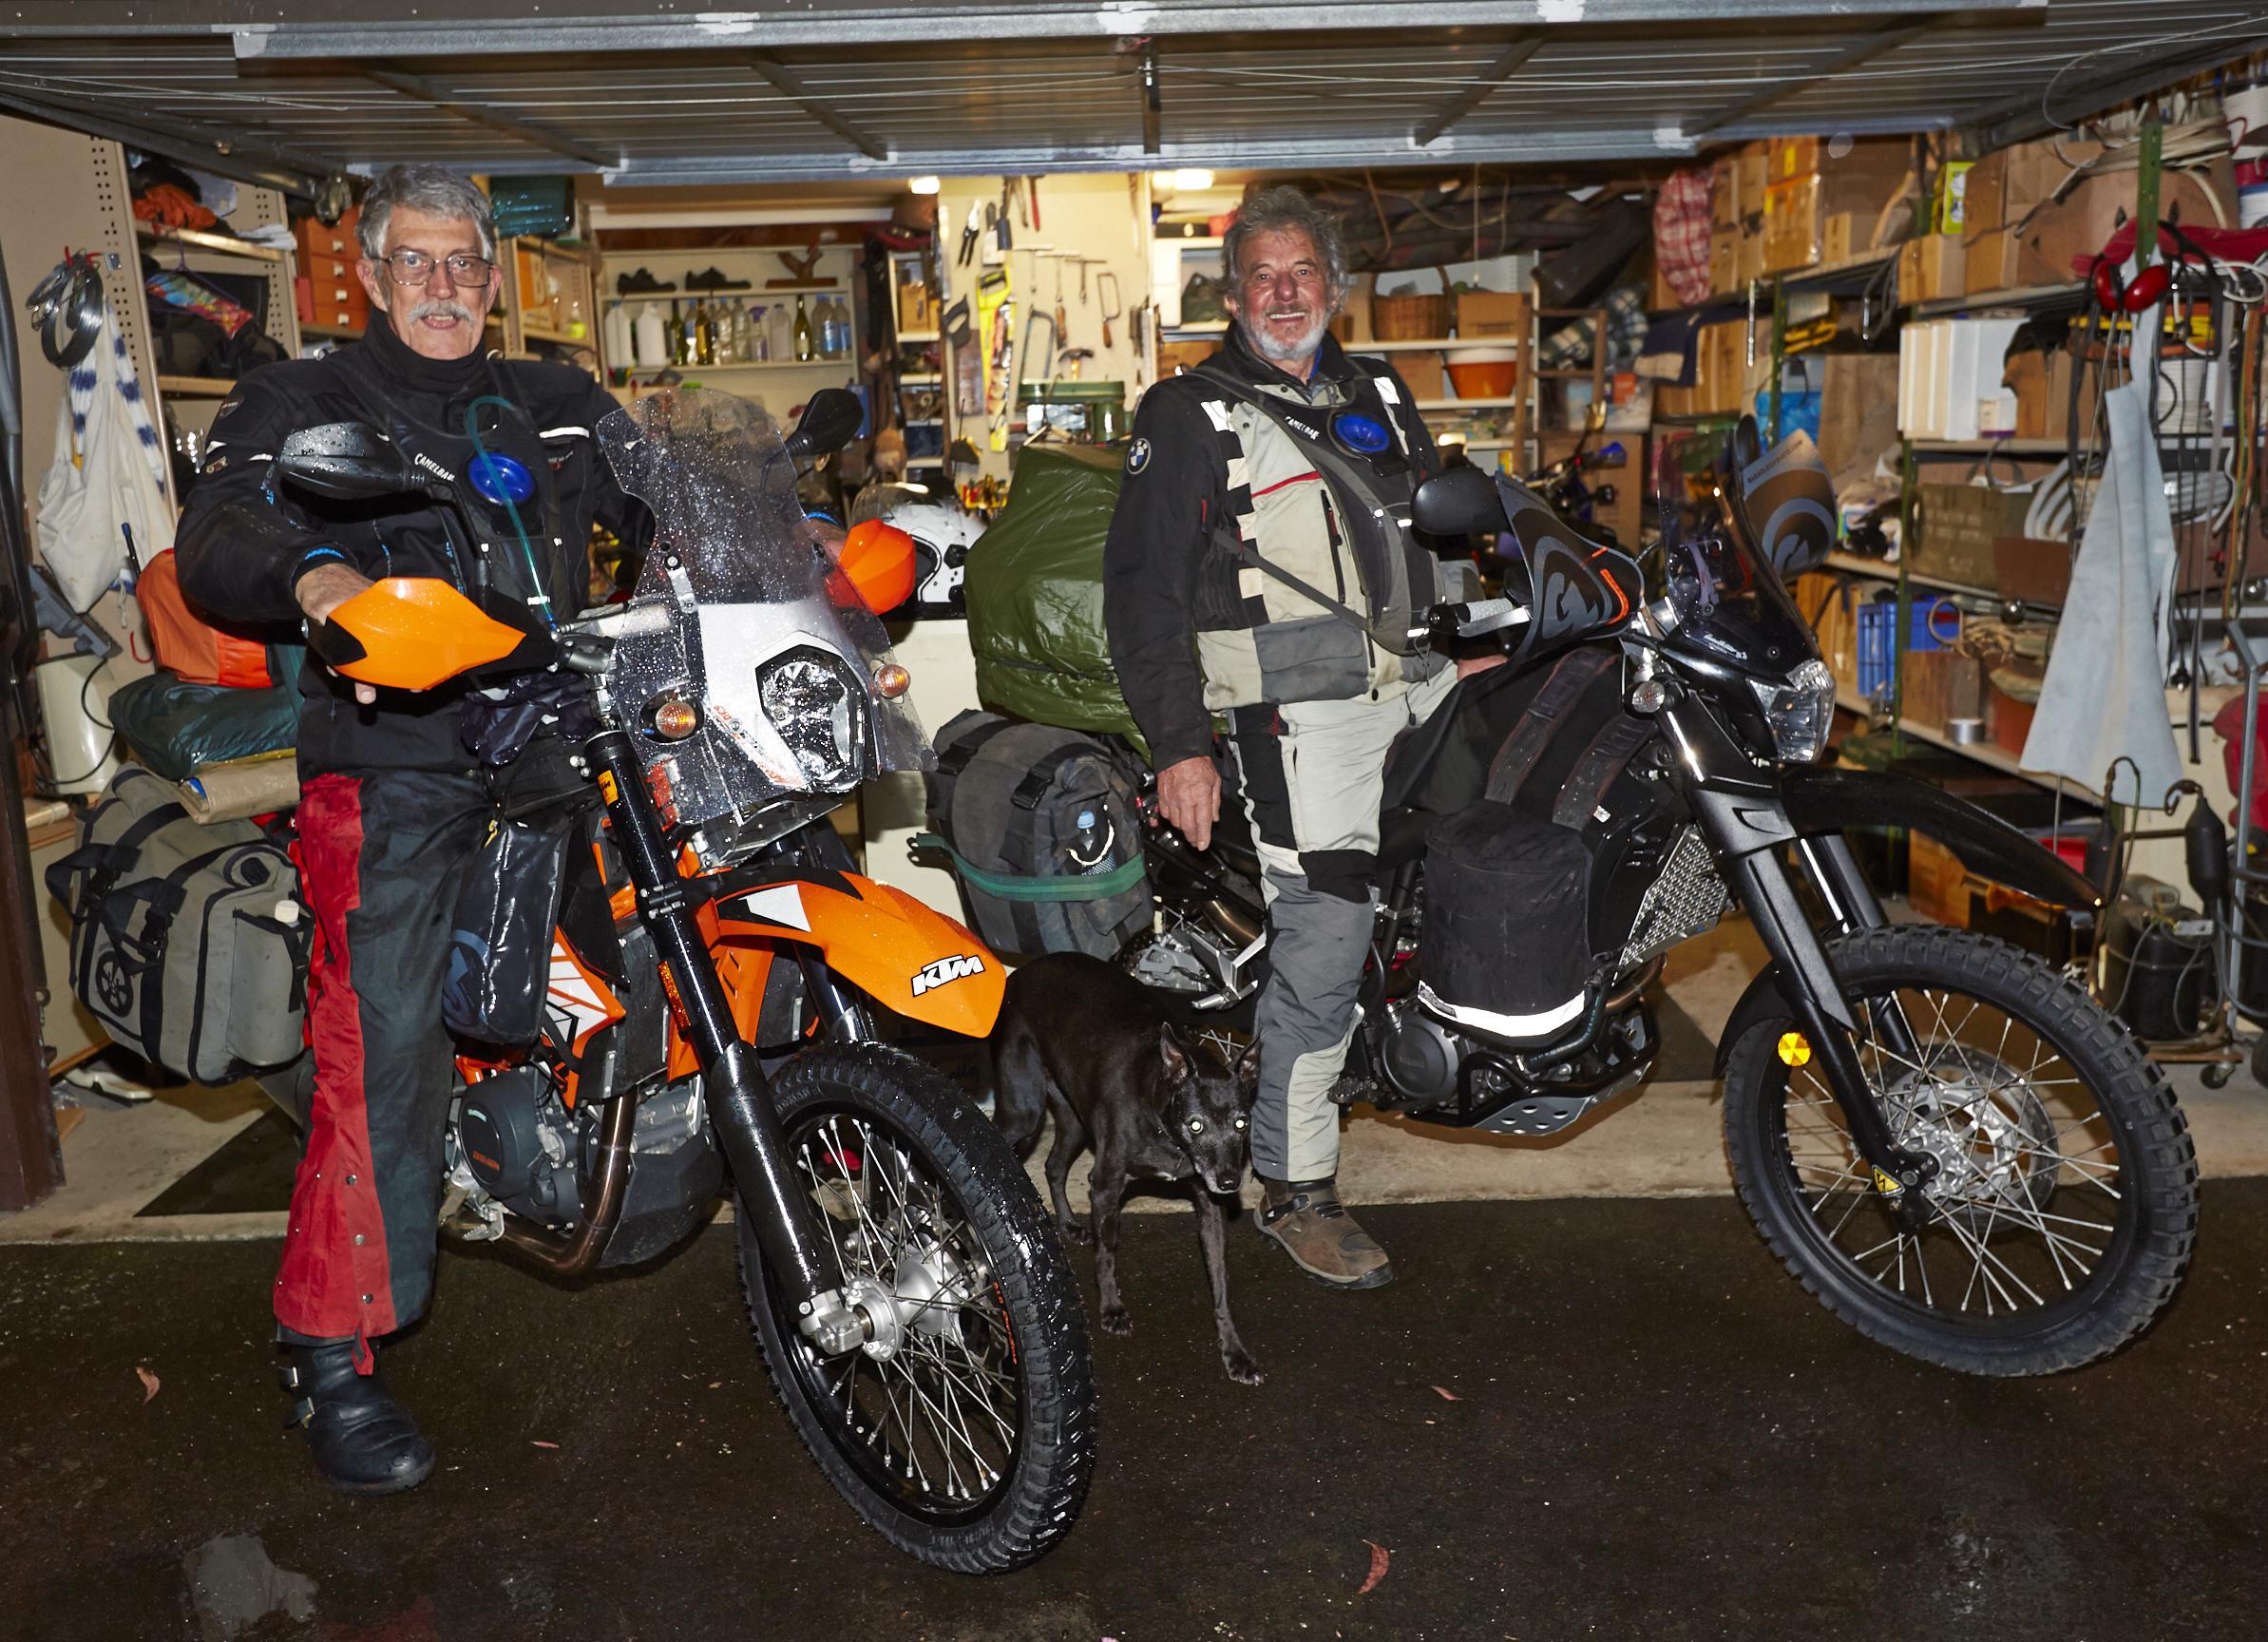 Finally leaving the garage - Ian Horsborgh and 'Eye of the Rider' veteran Paul Evans on their adventurised machines